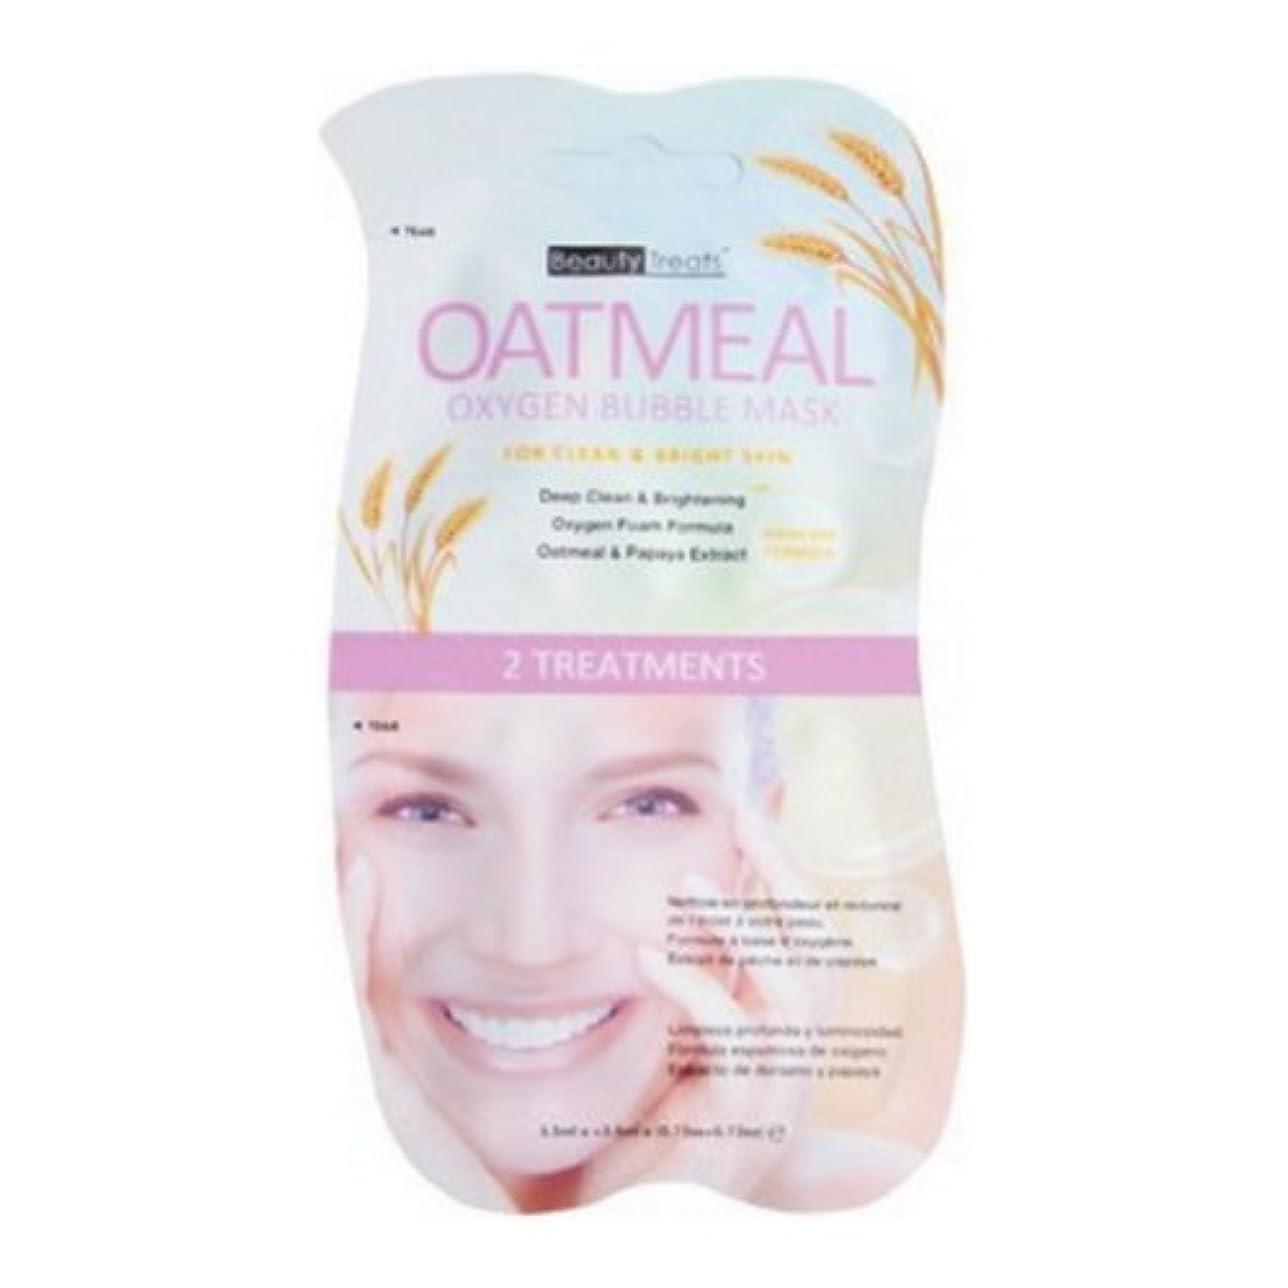 (6 Pack) BEAUTY TREATS Oatmeal Oxygen Bubble Mask - Oatmeal (並行輸入品)